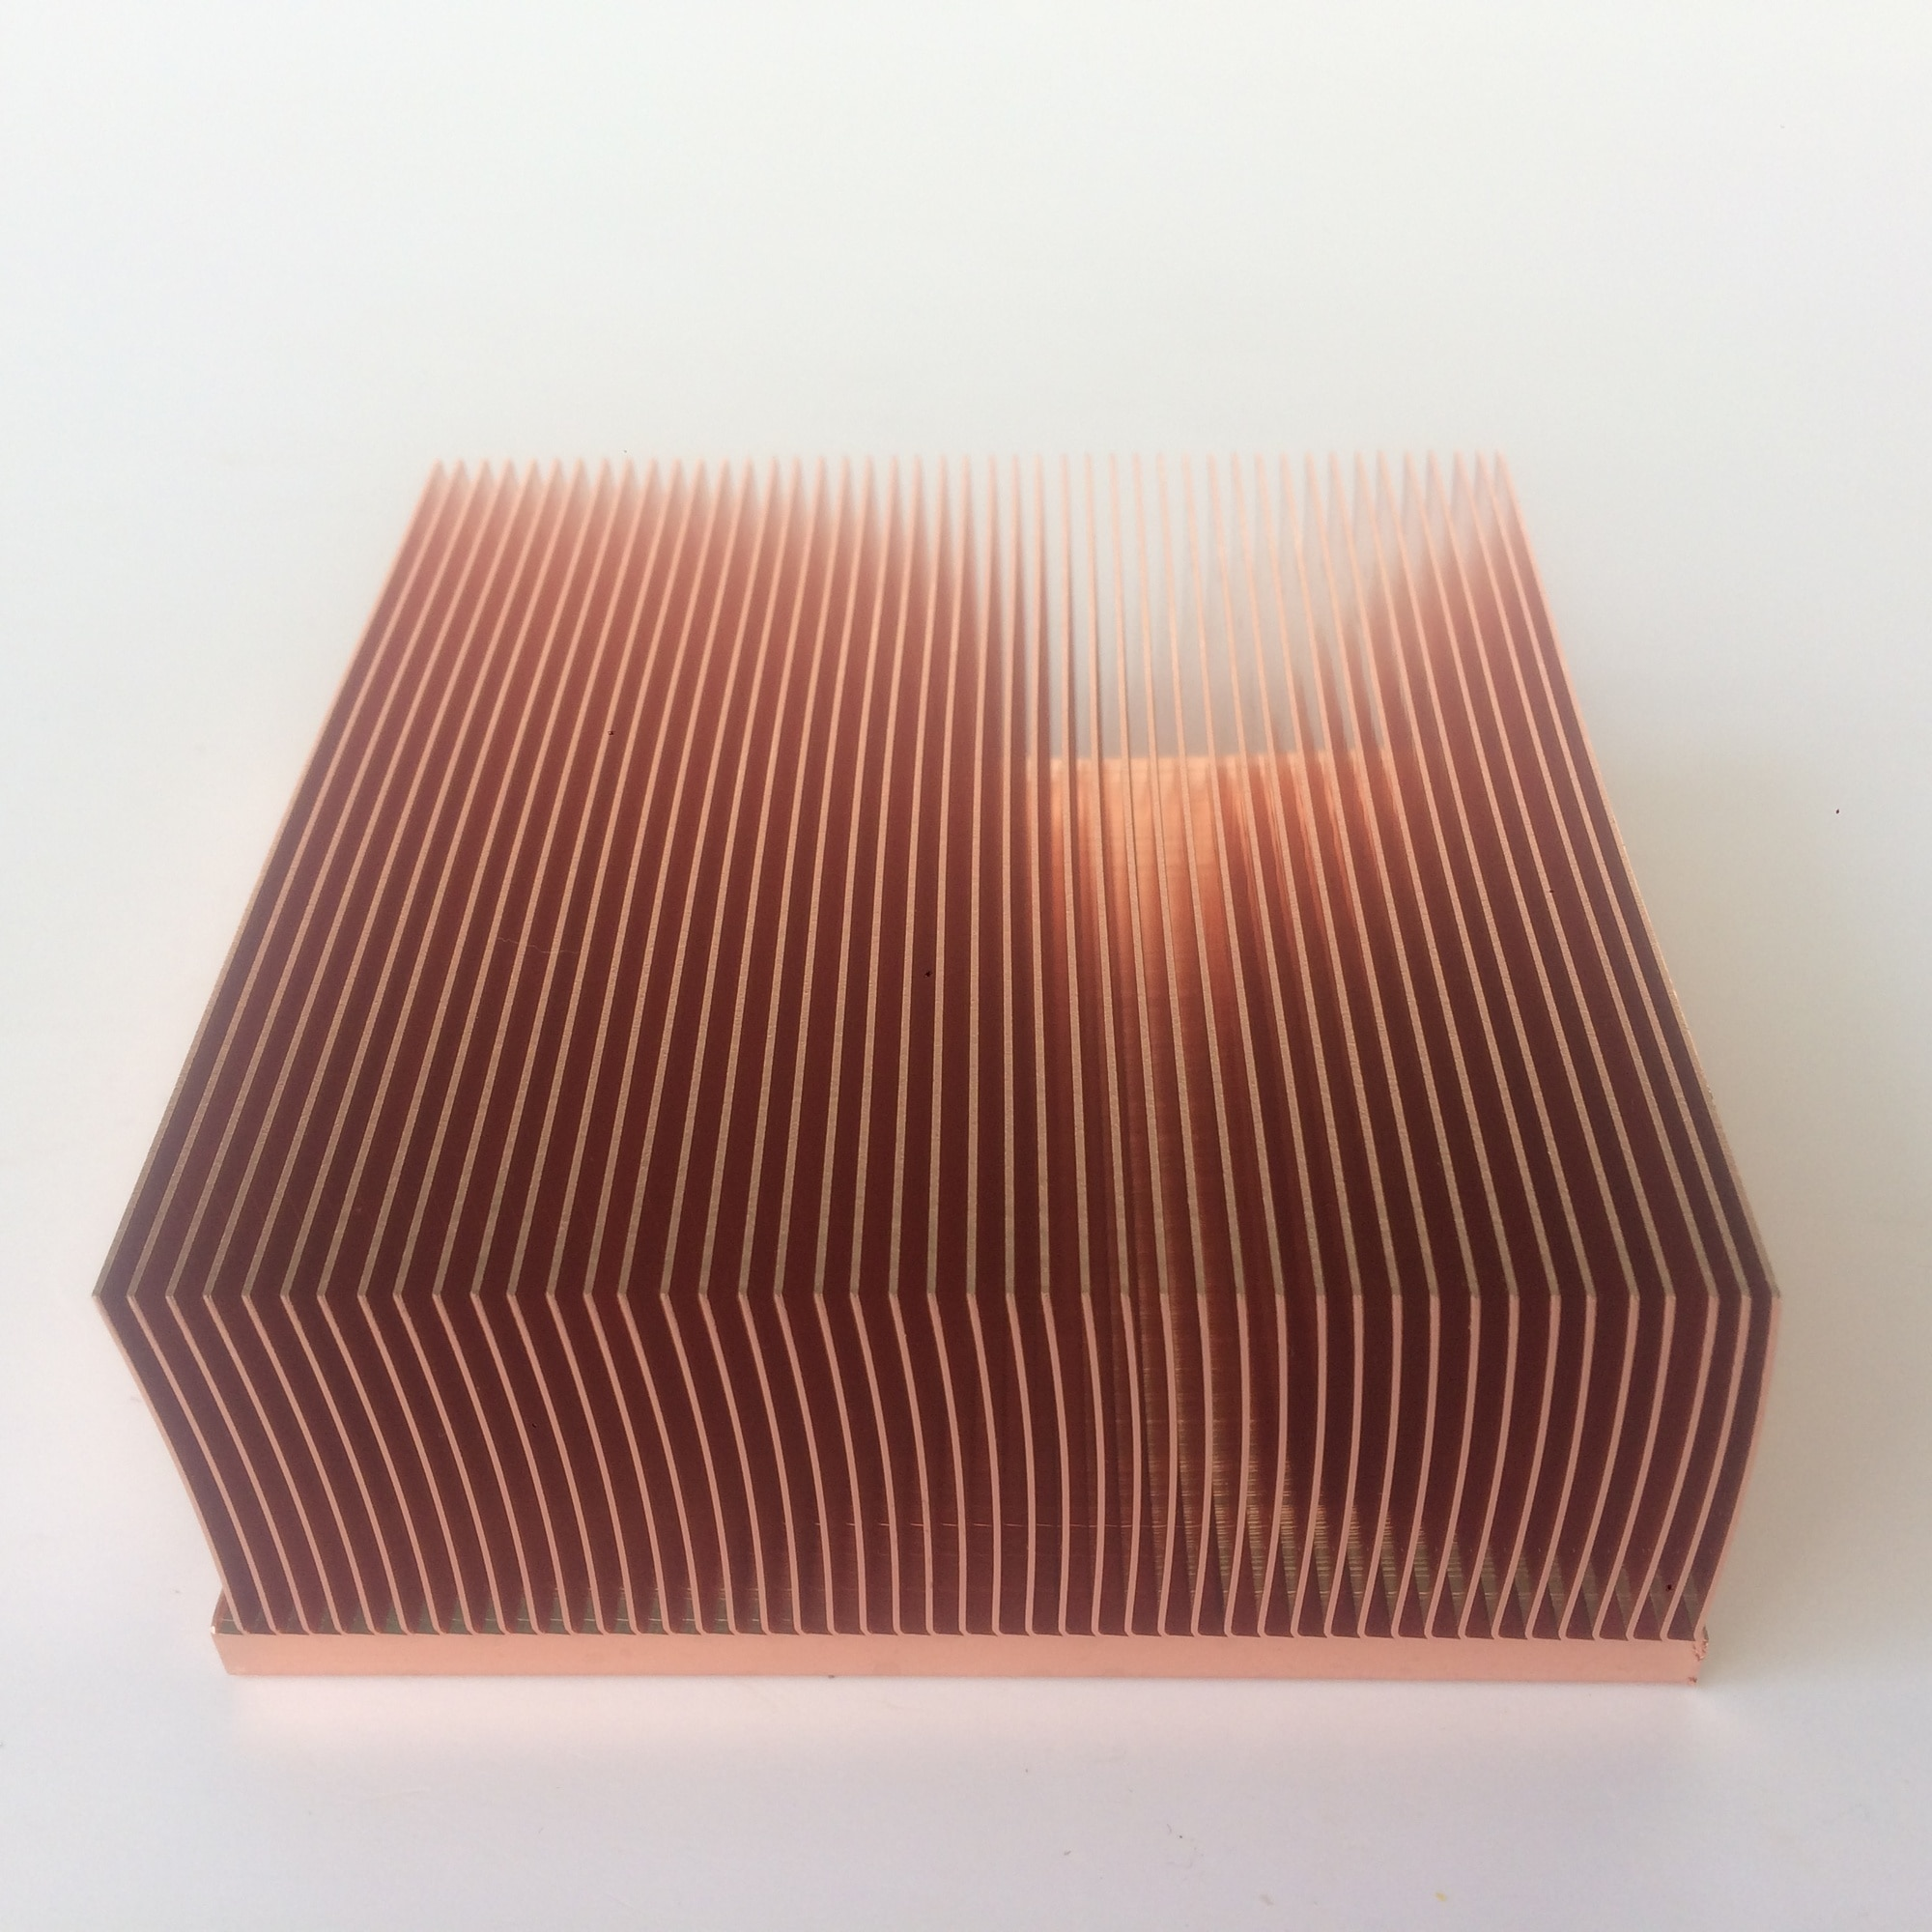 100x100x40mm High-power computer heat sink Power electronic radiator Machine radiator enlarge